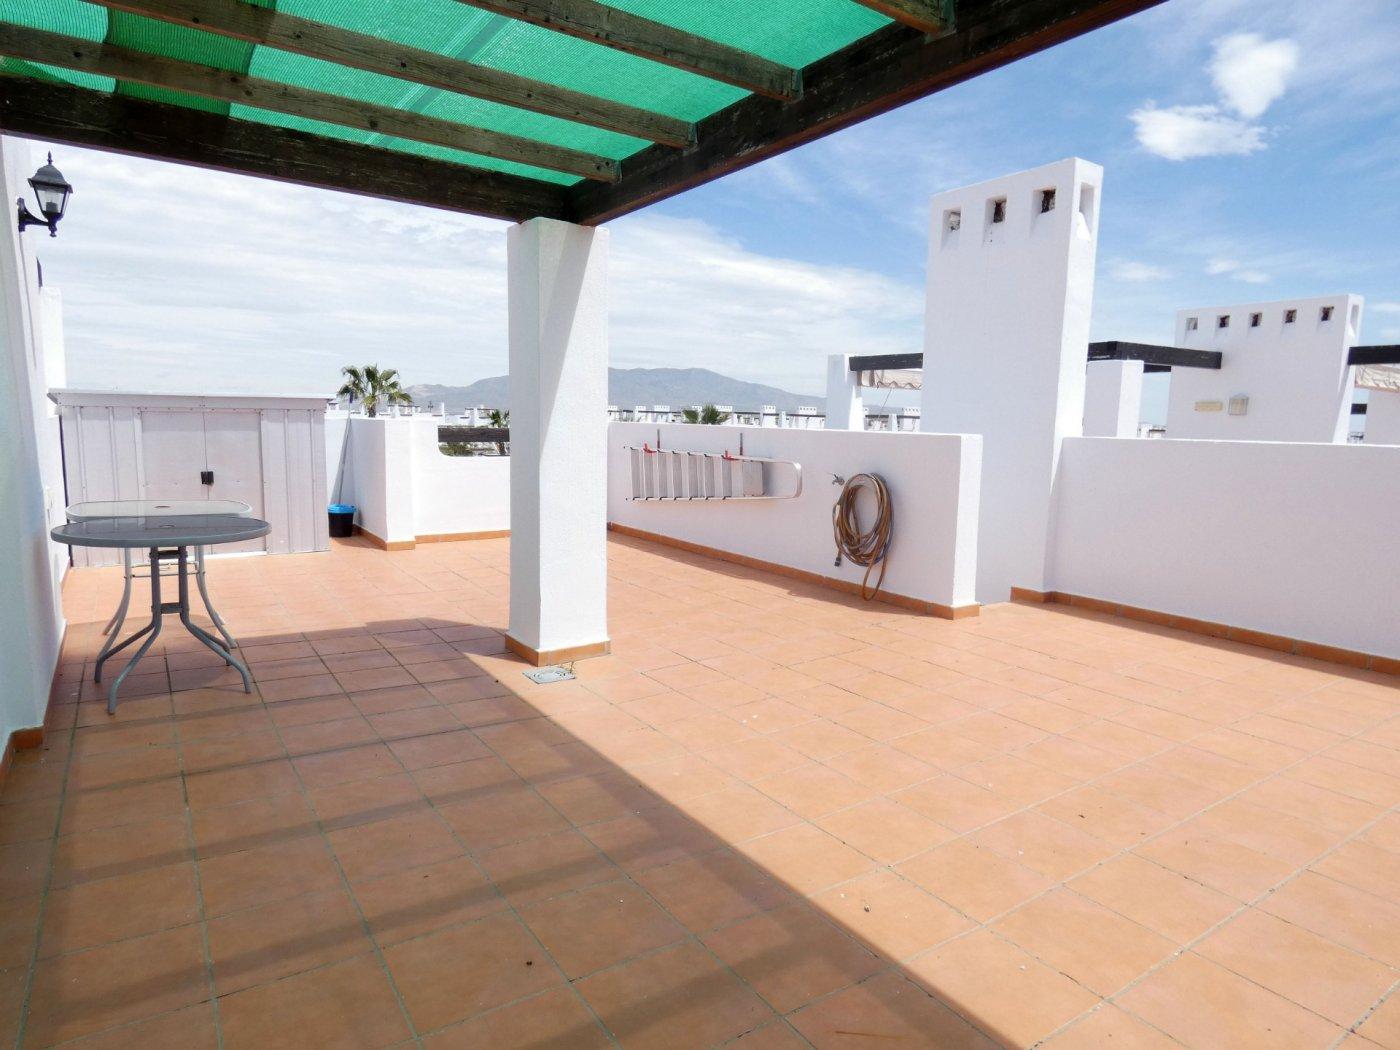 Gallery Image 32 of Key-Ready 2 Bedroom Apartment Overlooking the Citrus Groves in Jardin 10, Condado de Alhama